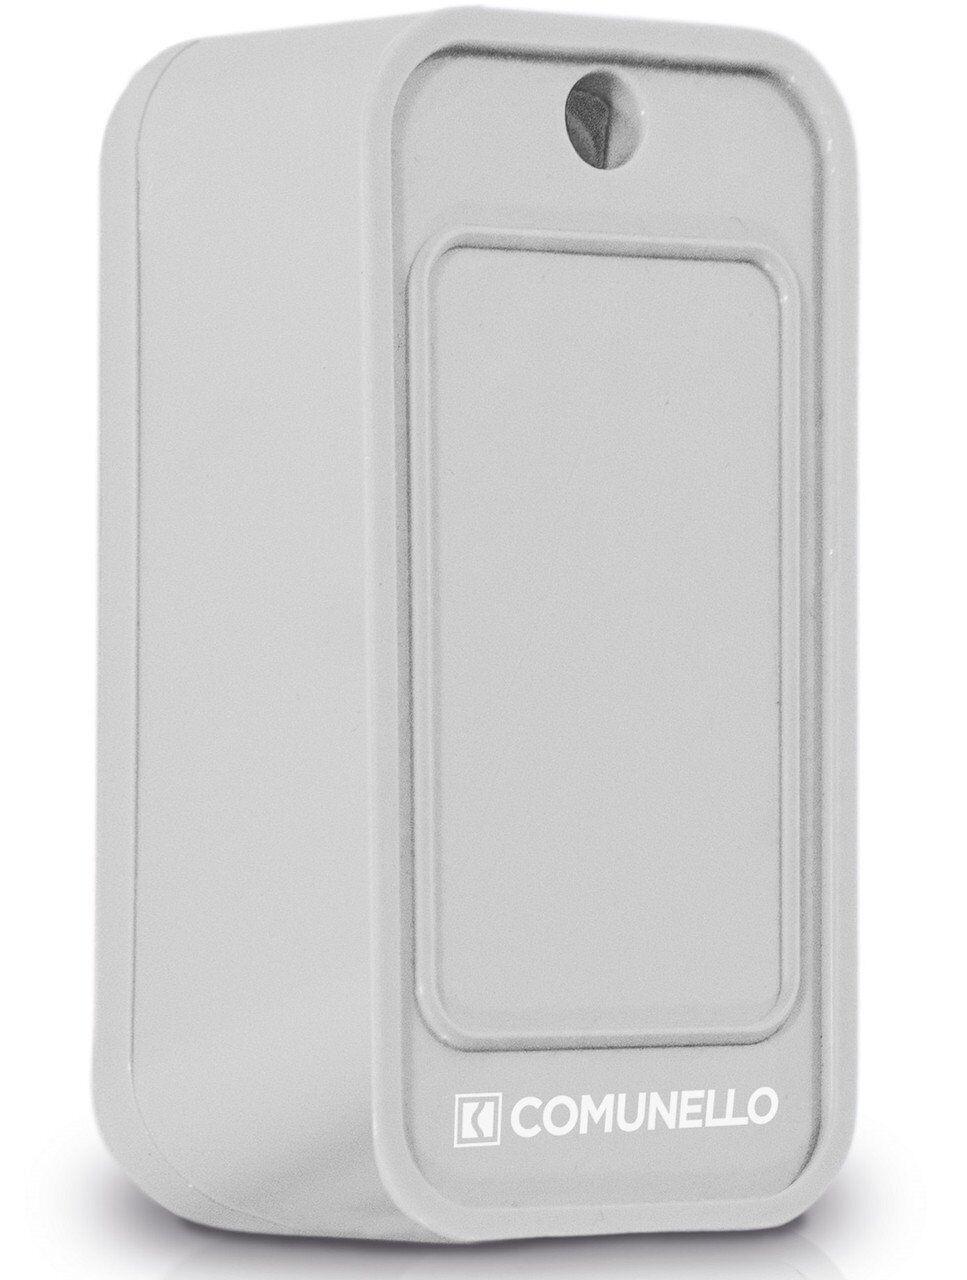 Приемник Comunello RCV (Receiver) 499502400